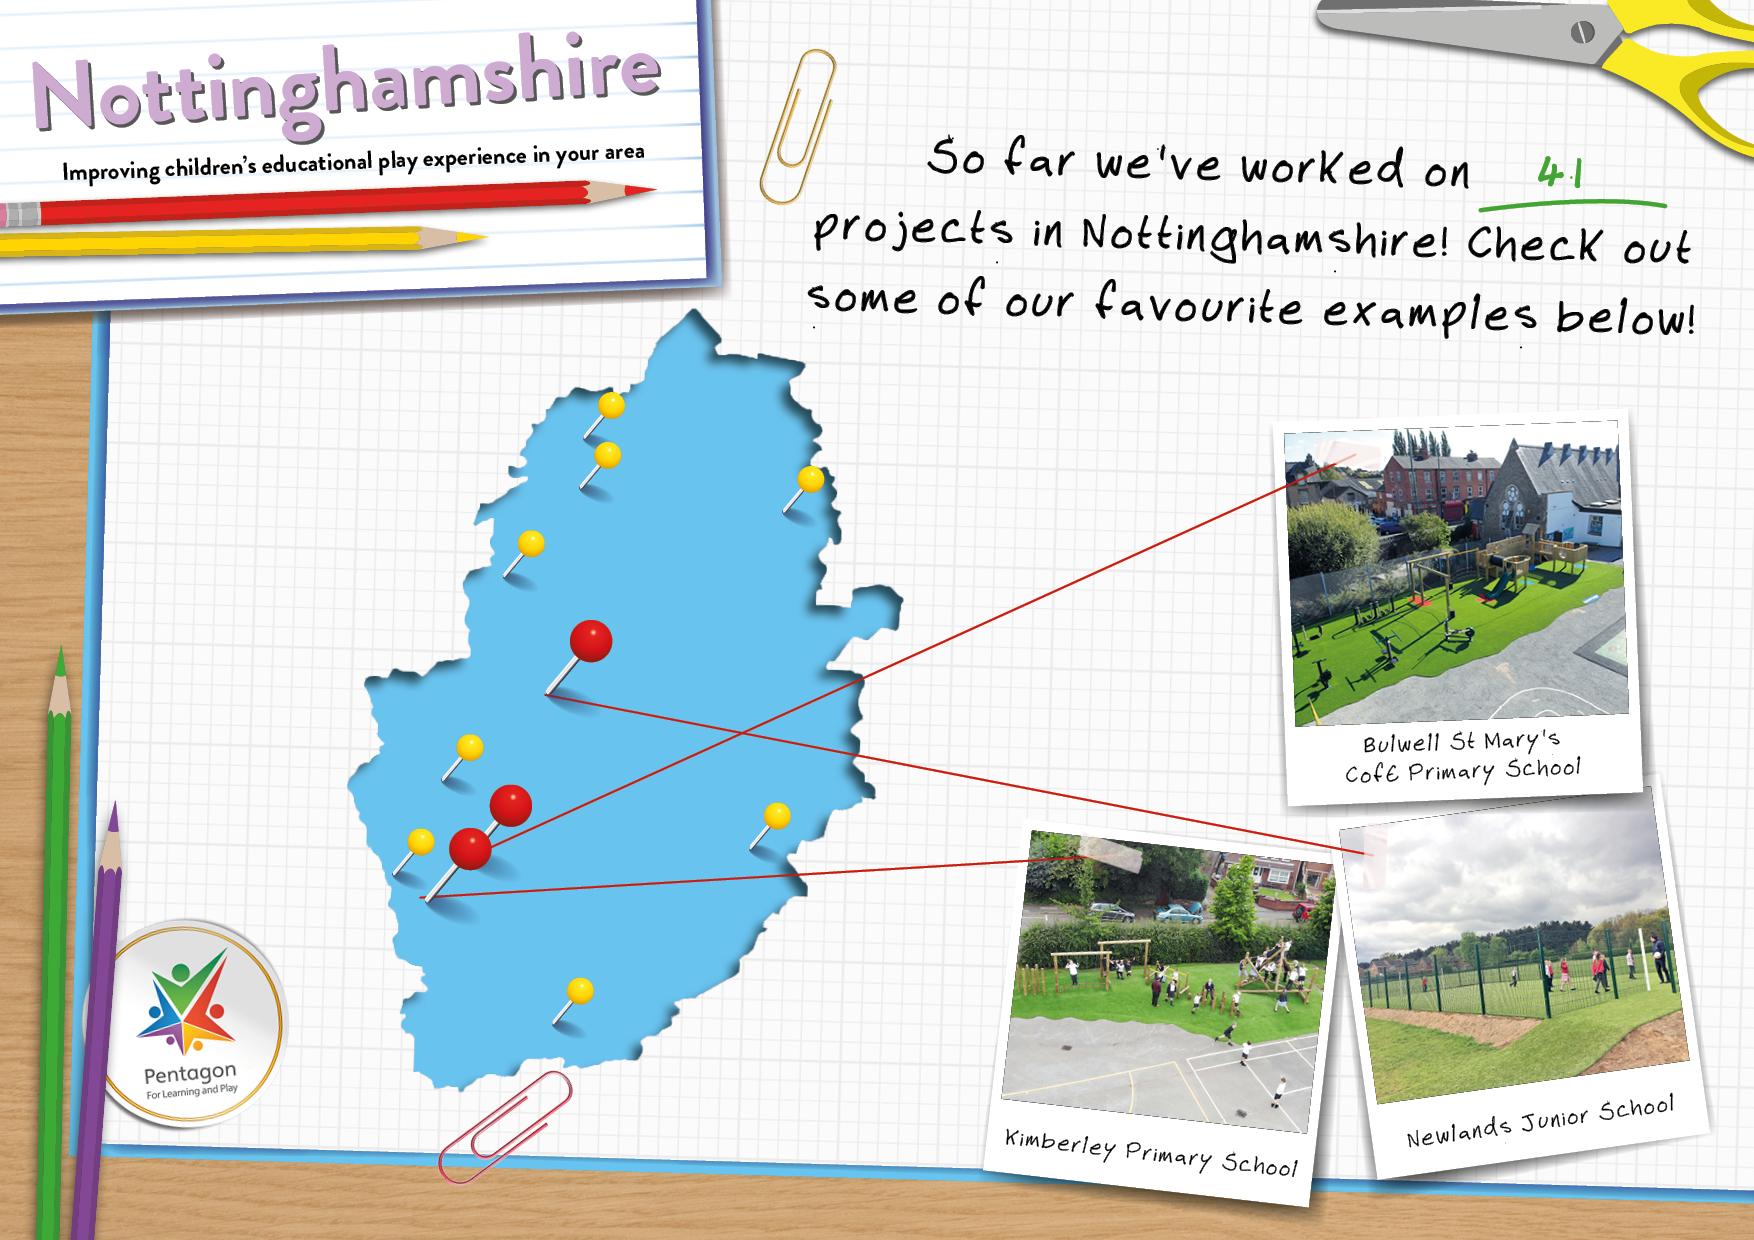 School Playground Equipment in Nottinghamshire